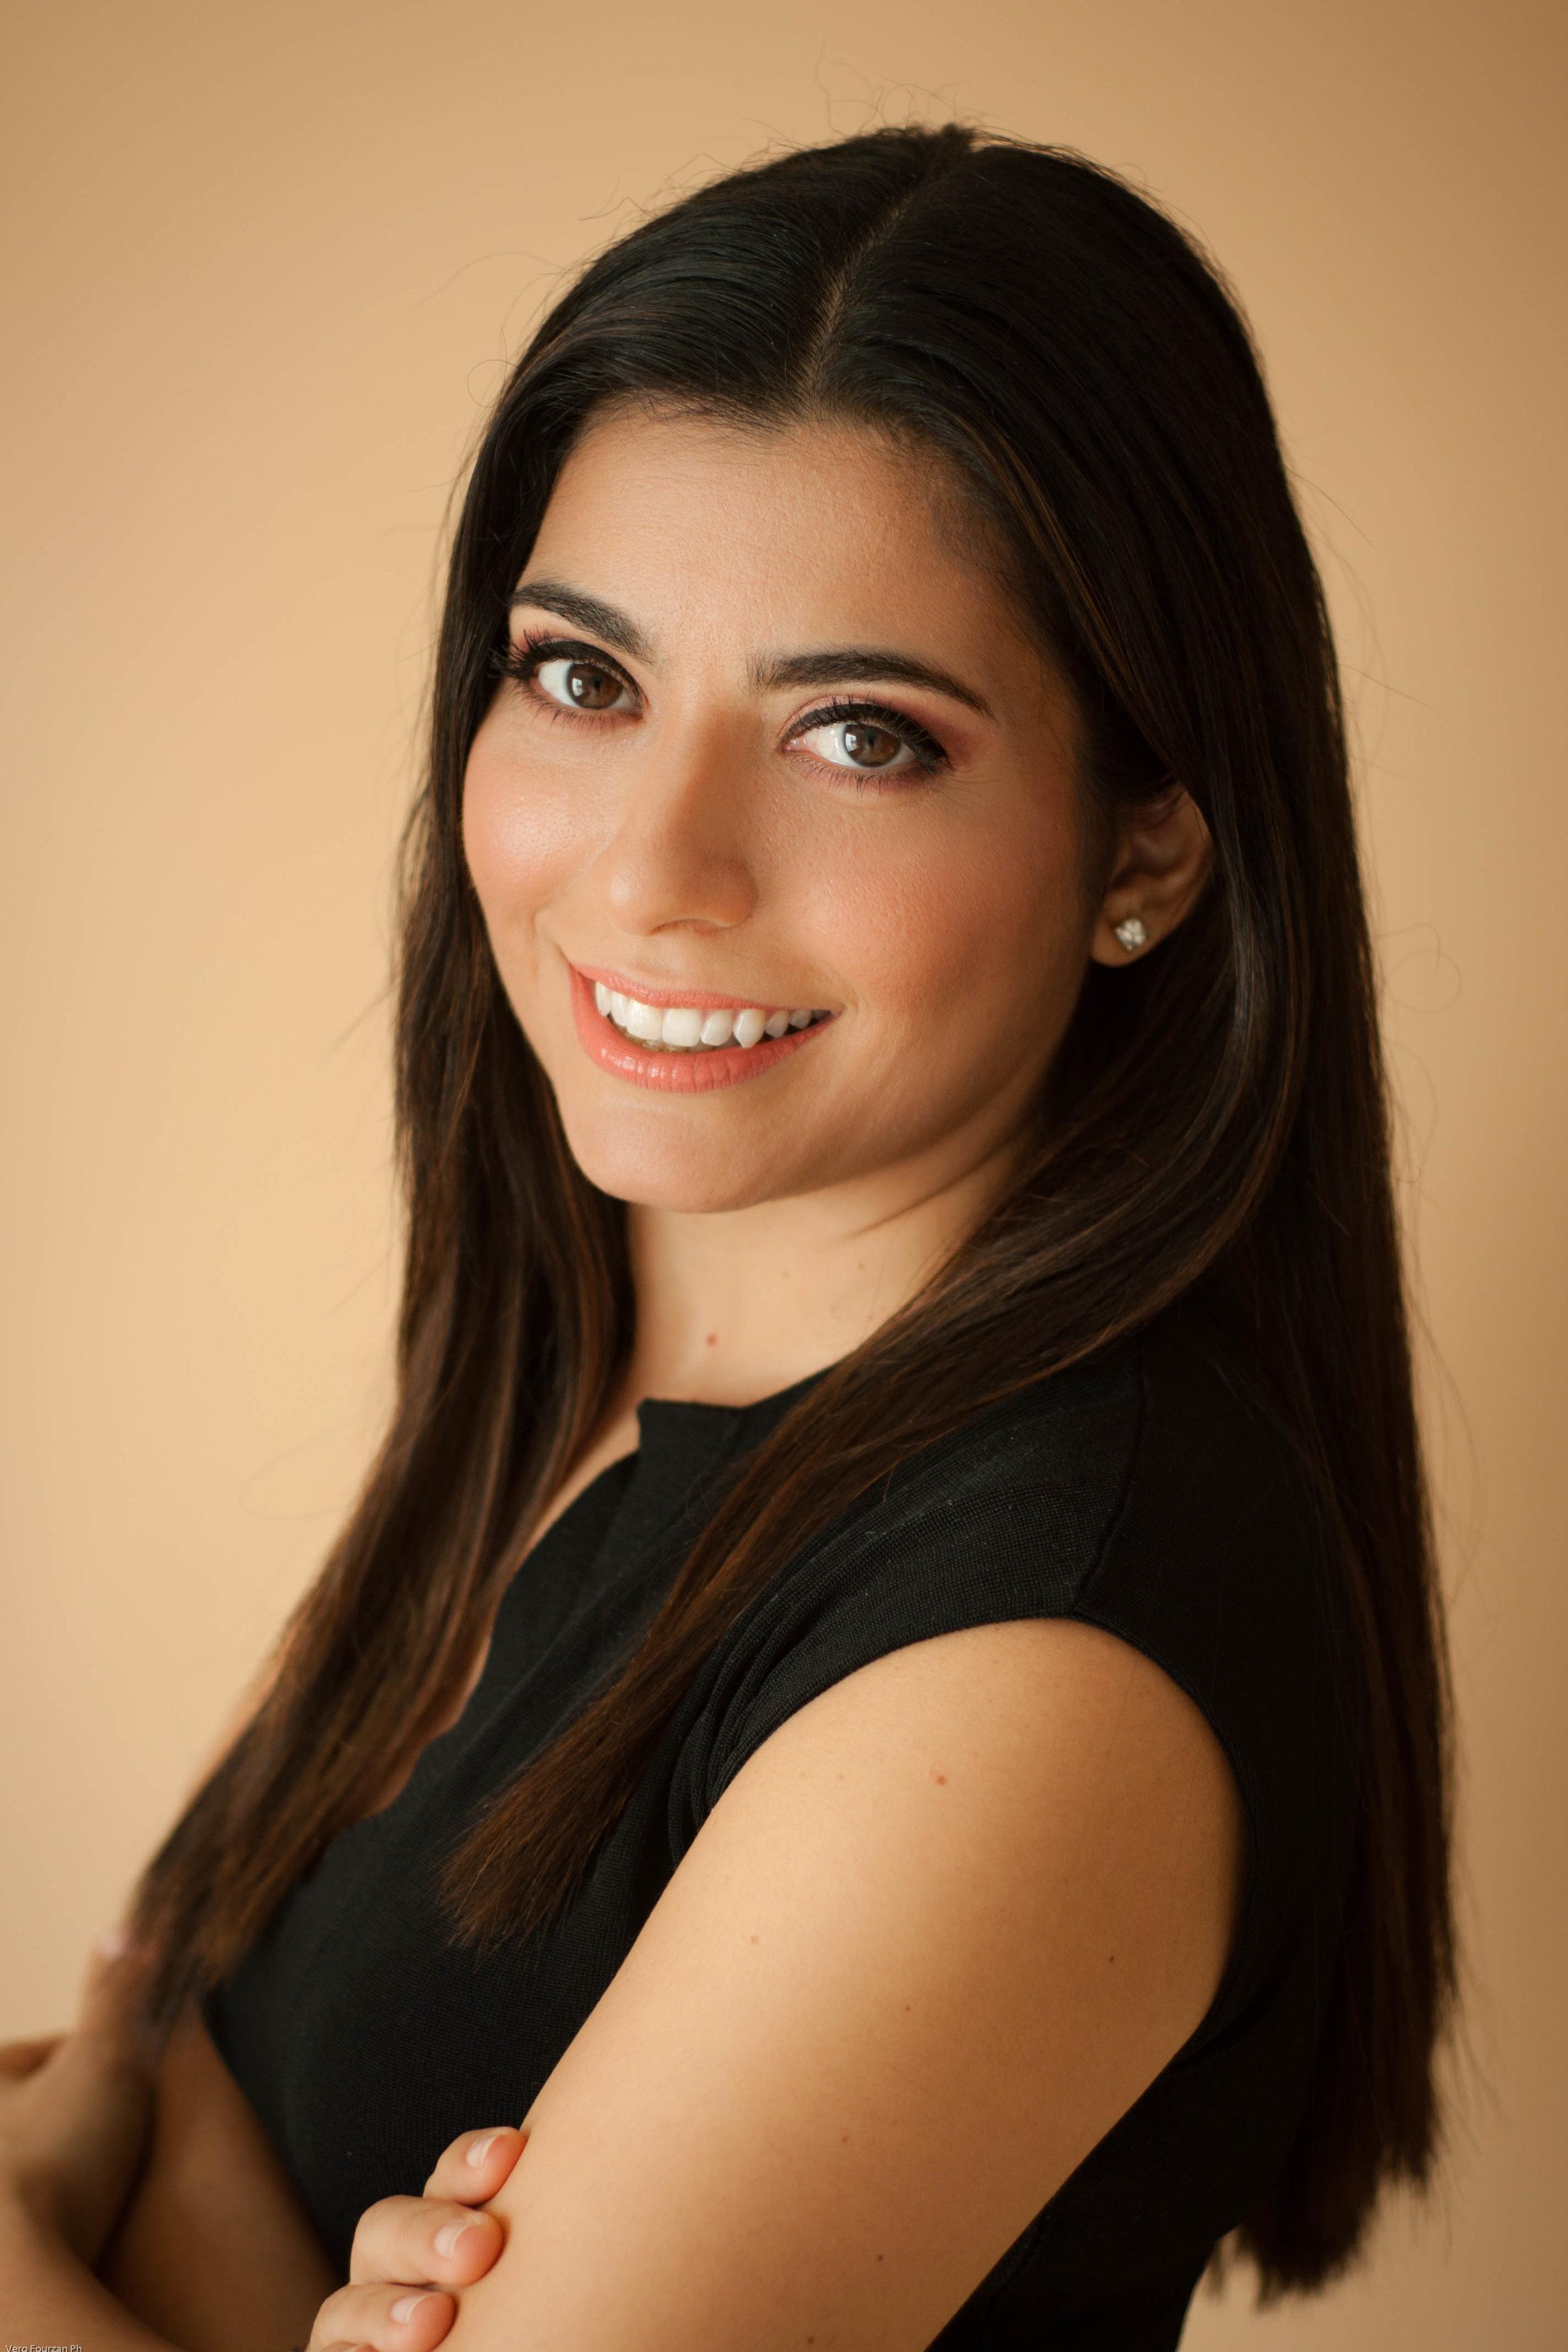 Ana Selva - Broker InmobiliarioIdiomas: Español / Aleman / Inglesana@selvacorealty.com